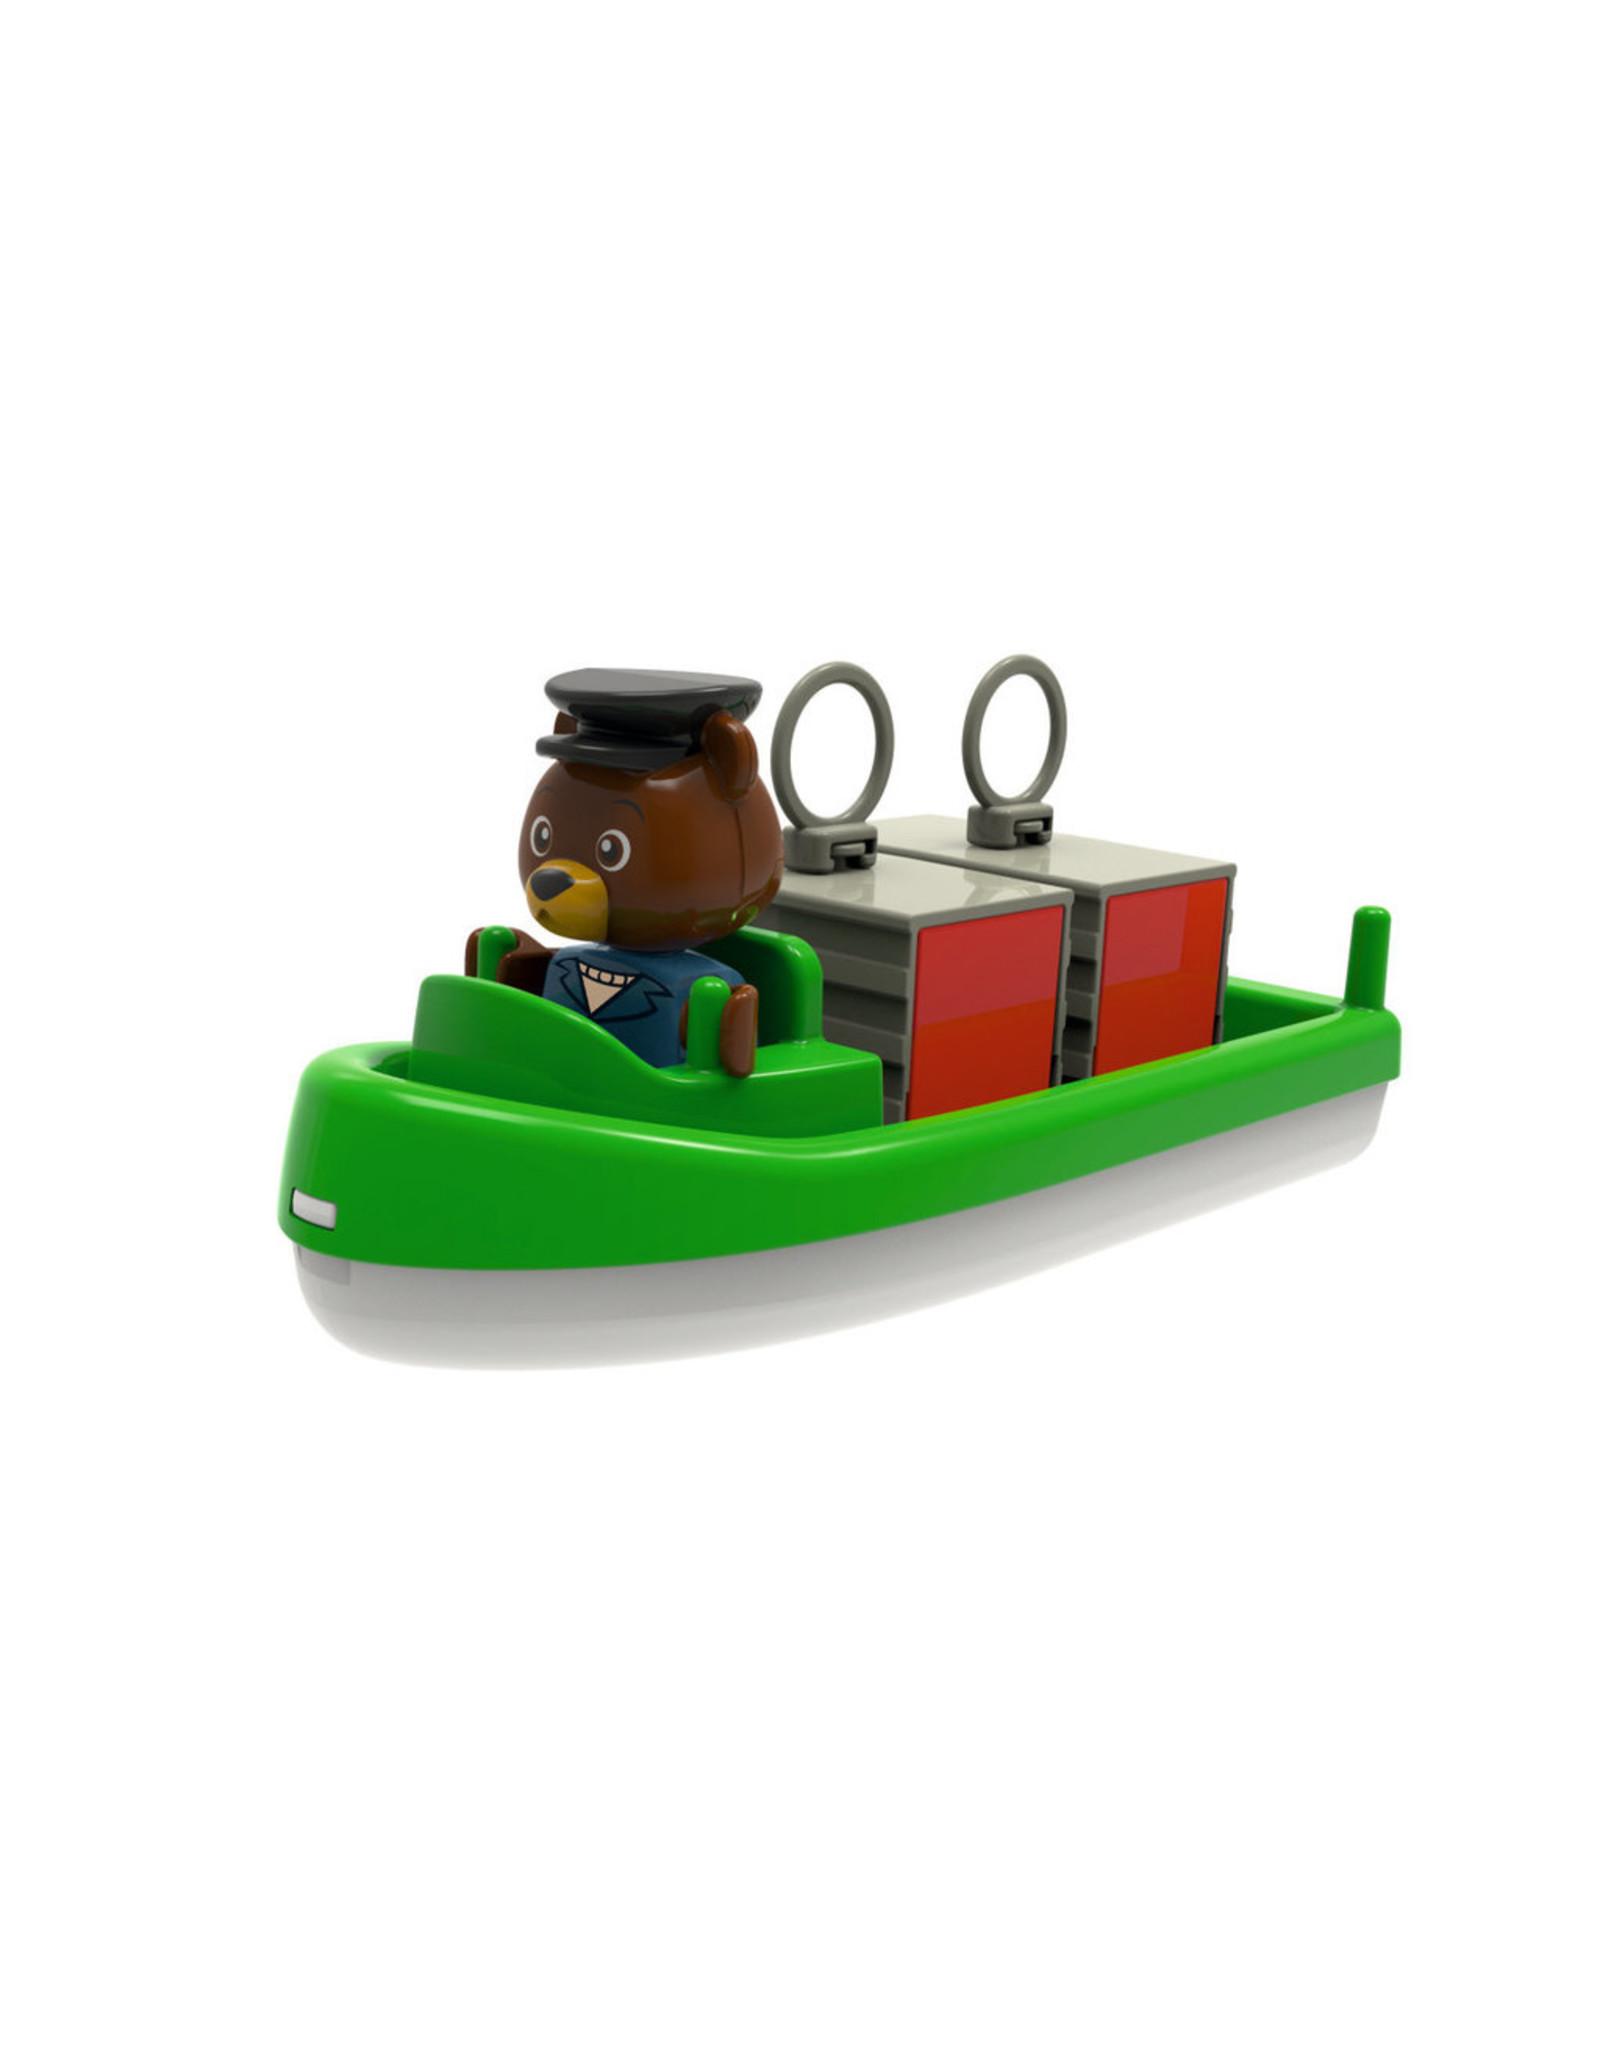 AquaPlay AquaPlay BoatSet